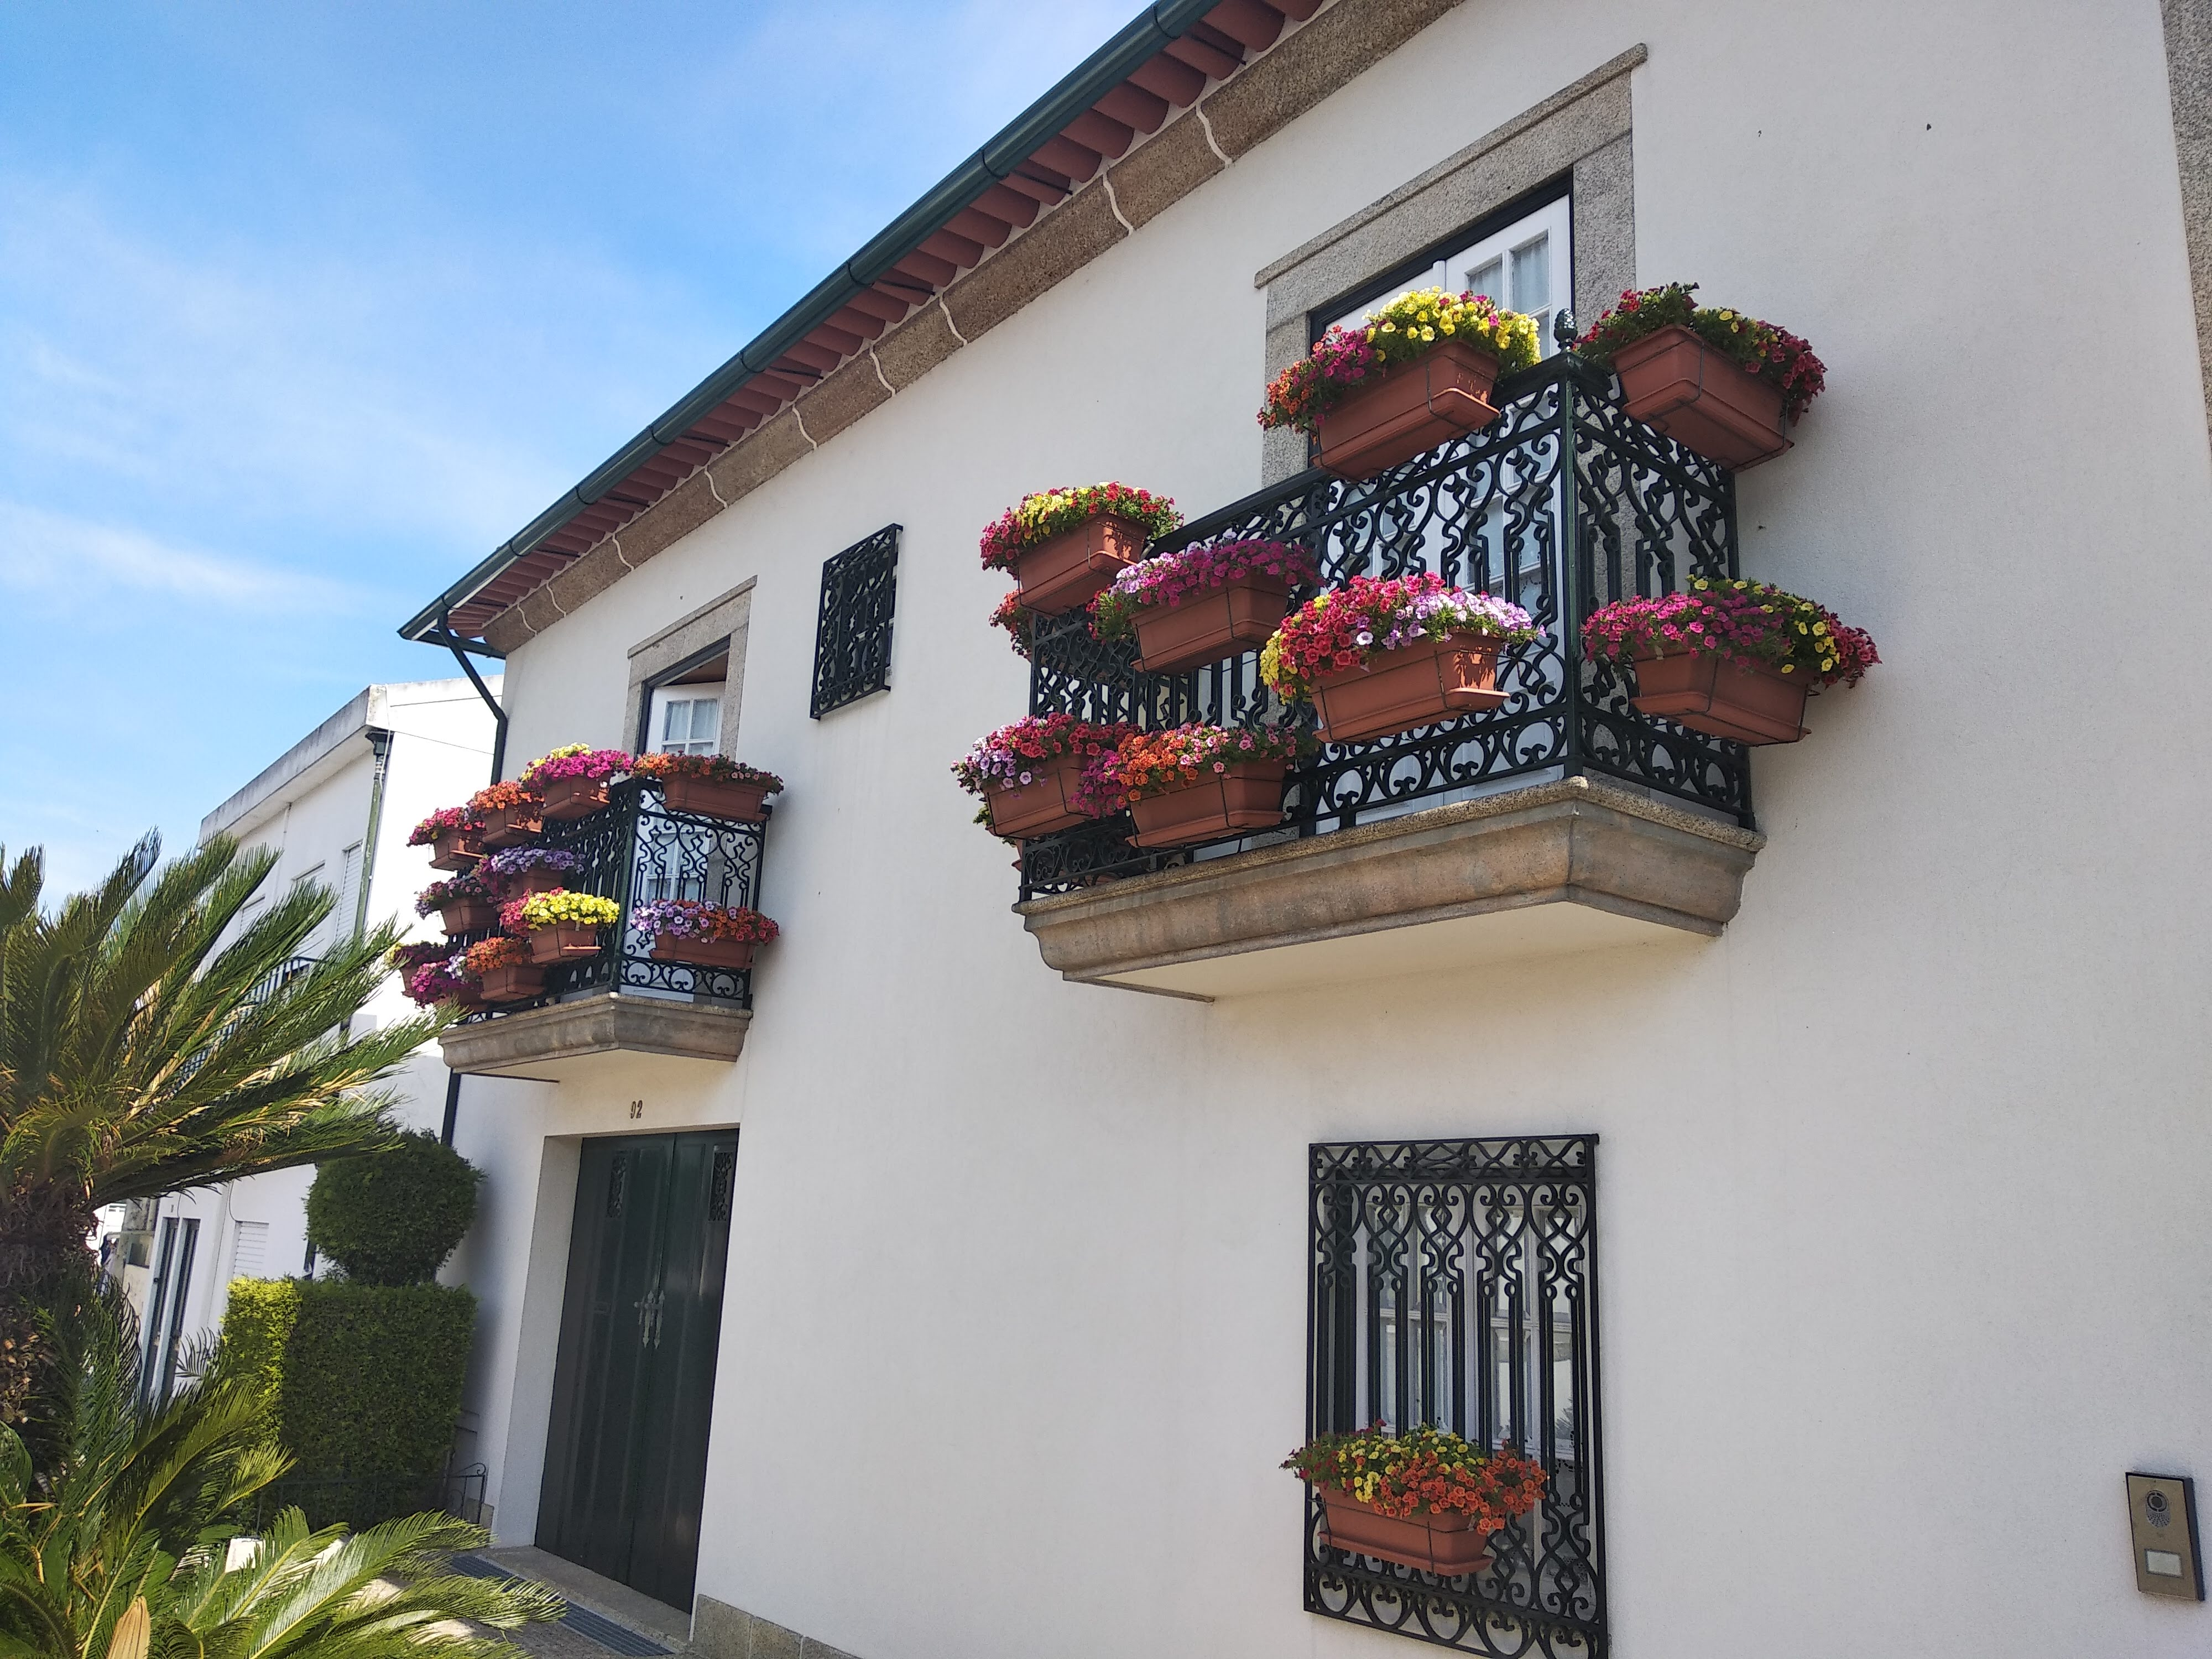 Concurso Barcelos Florido com grande número de participantes